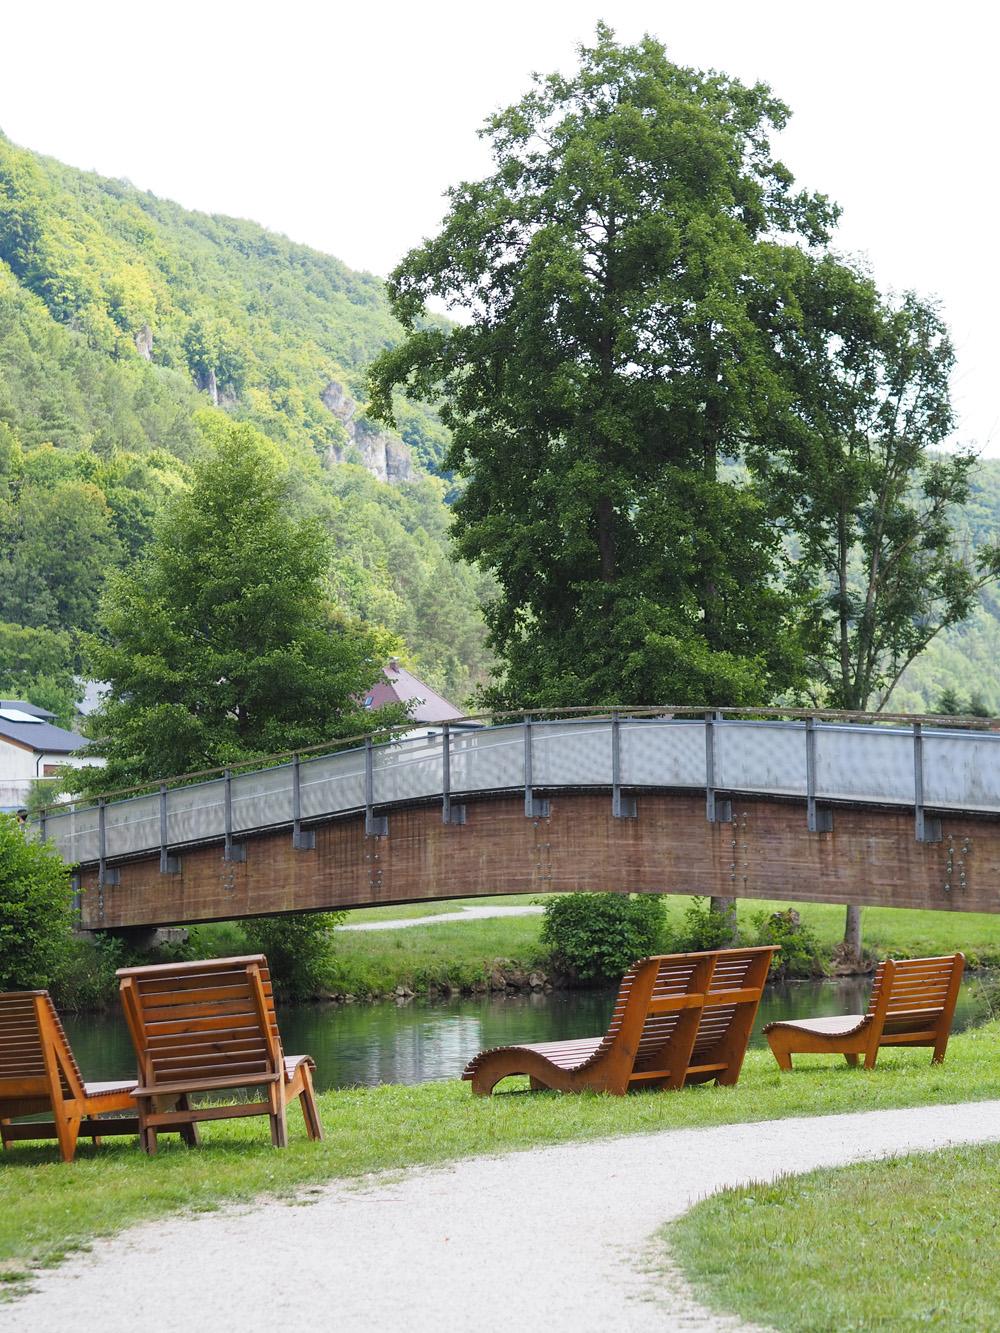 coucoubonheur_lifestyleblog_nuernberg_Kajak_fraenkische_schweiz